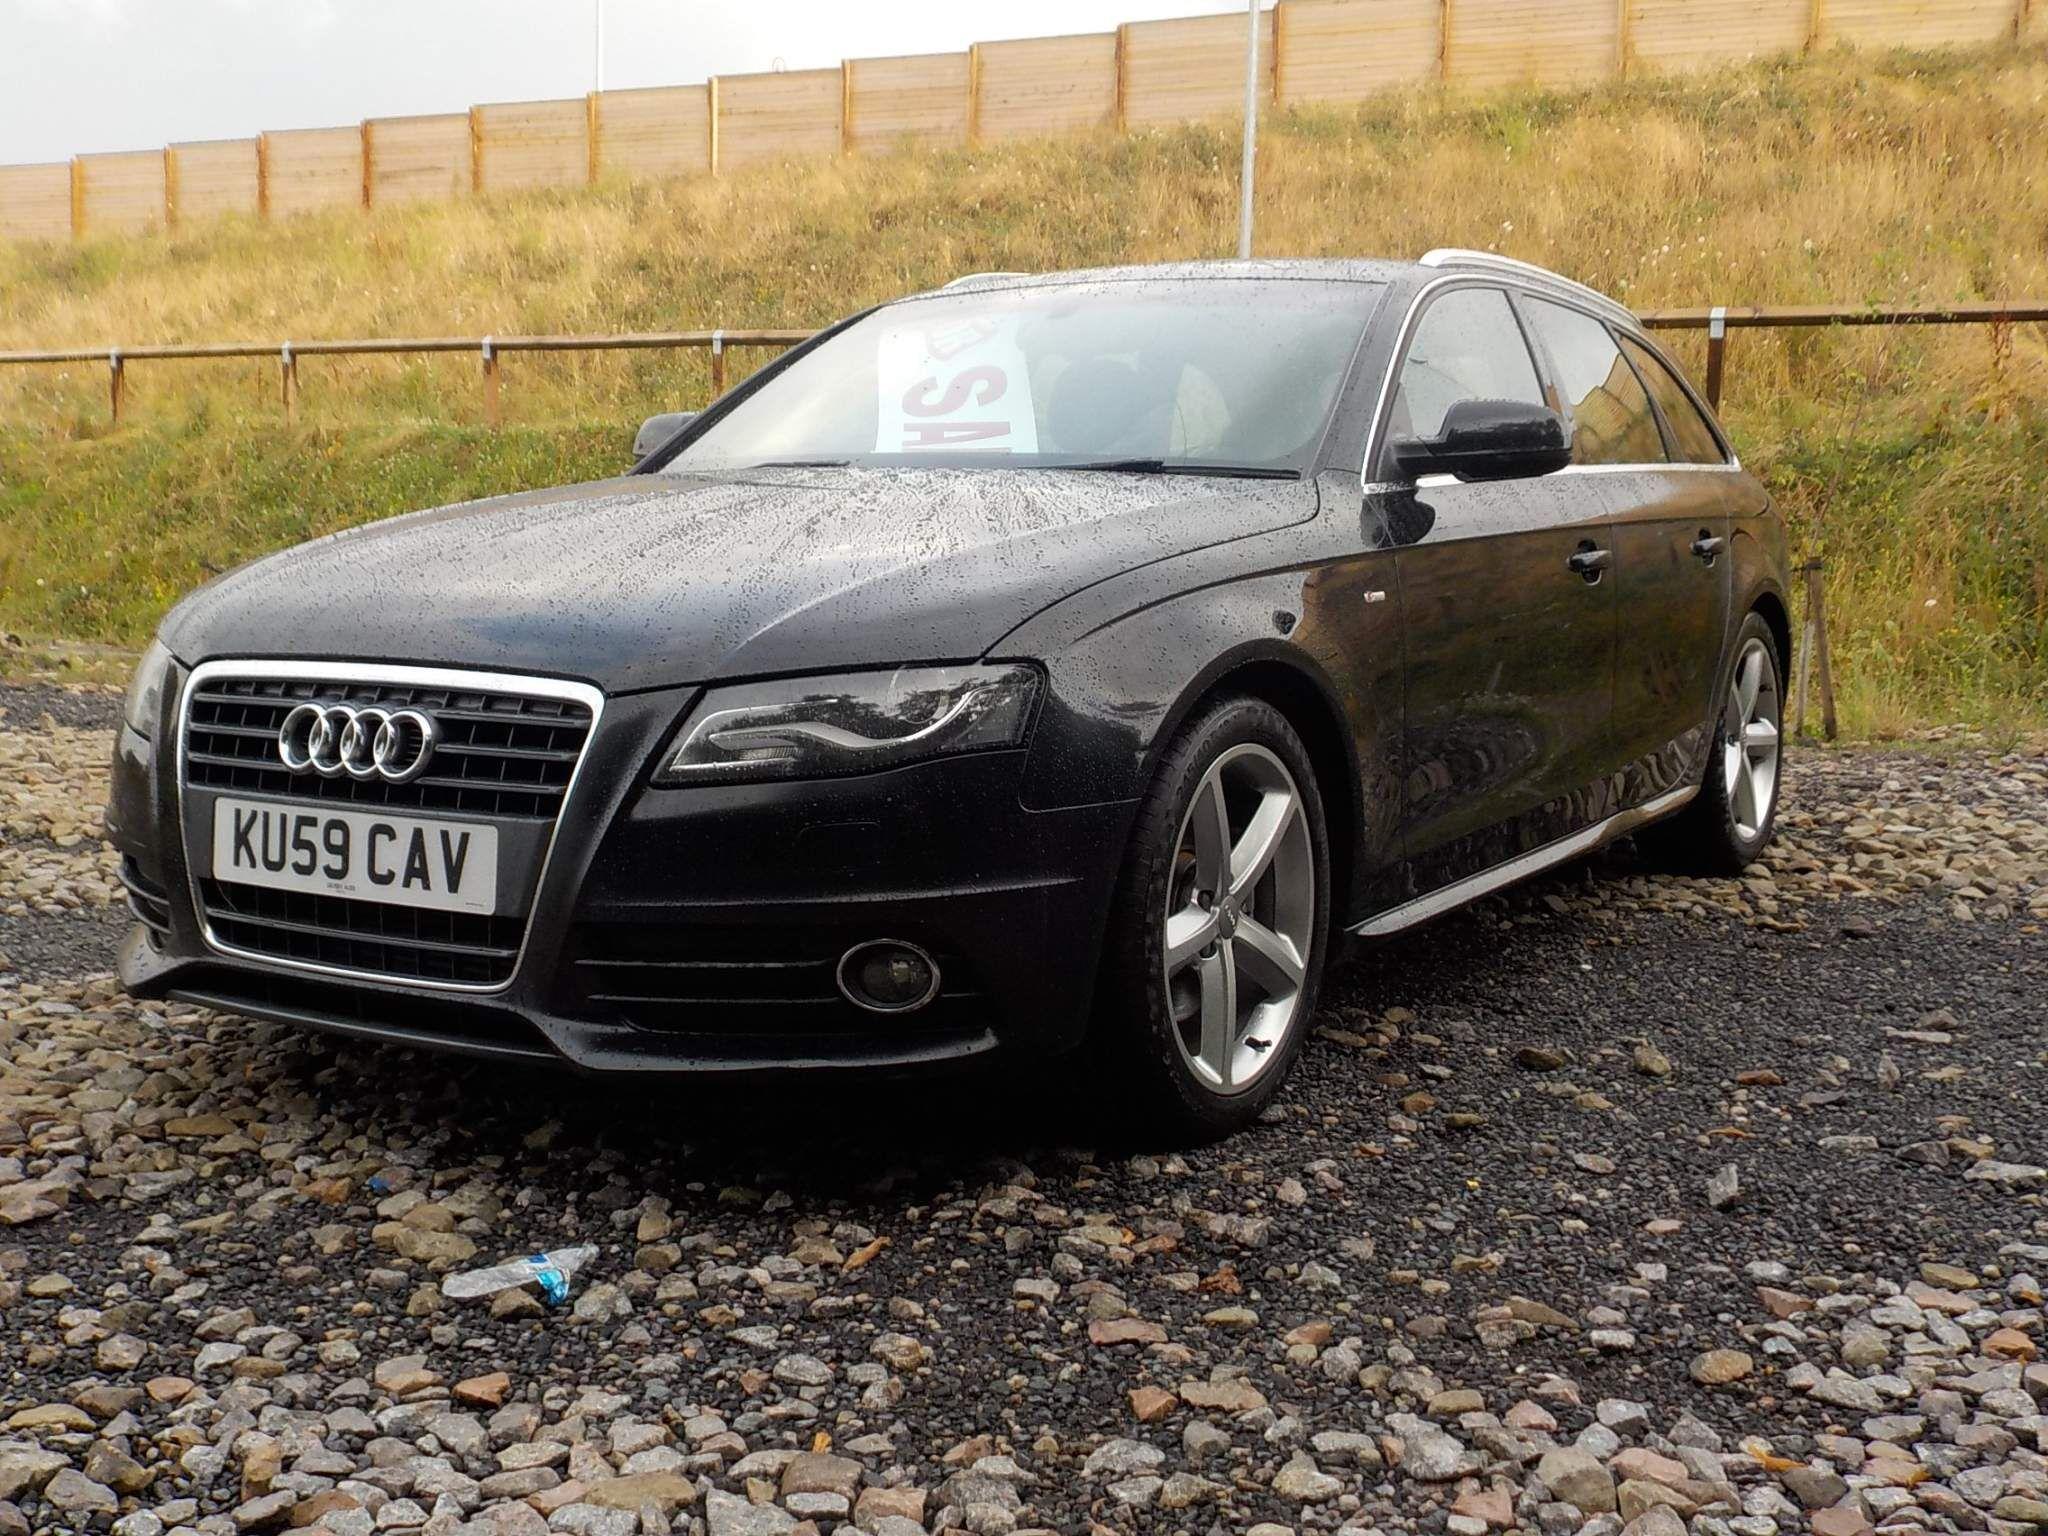 Audi A4 Avant 2.0 TDI S line Avant 5dr